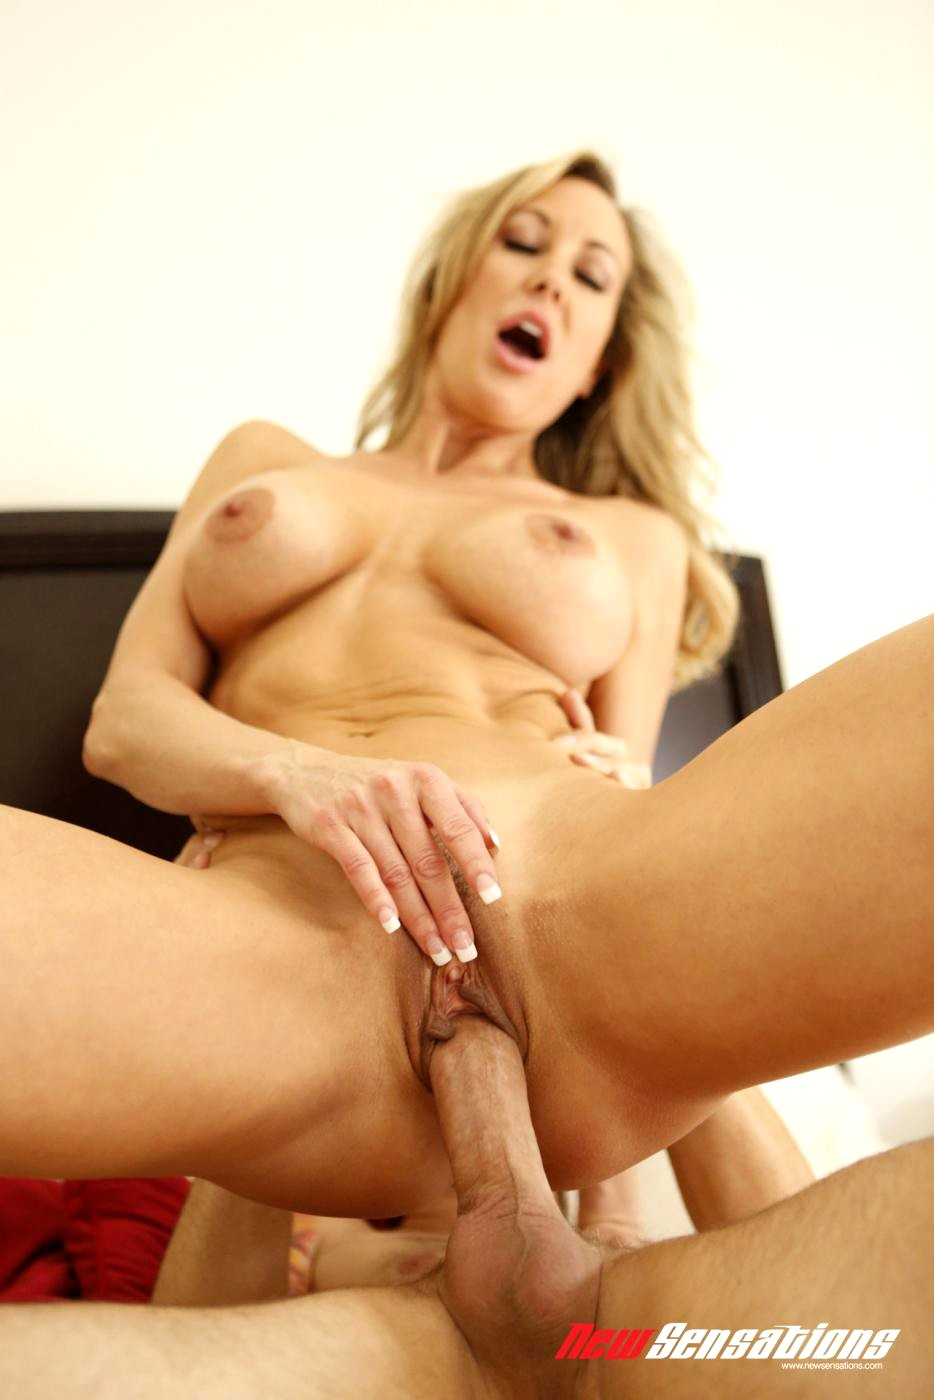 Brandi love porn pics-7729